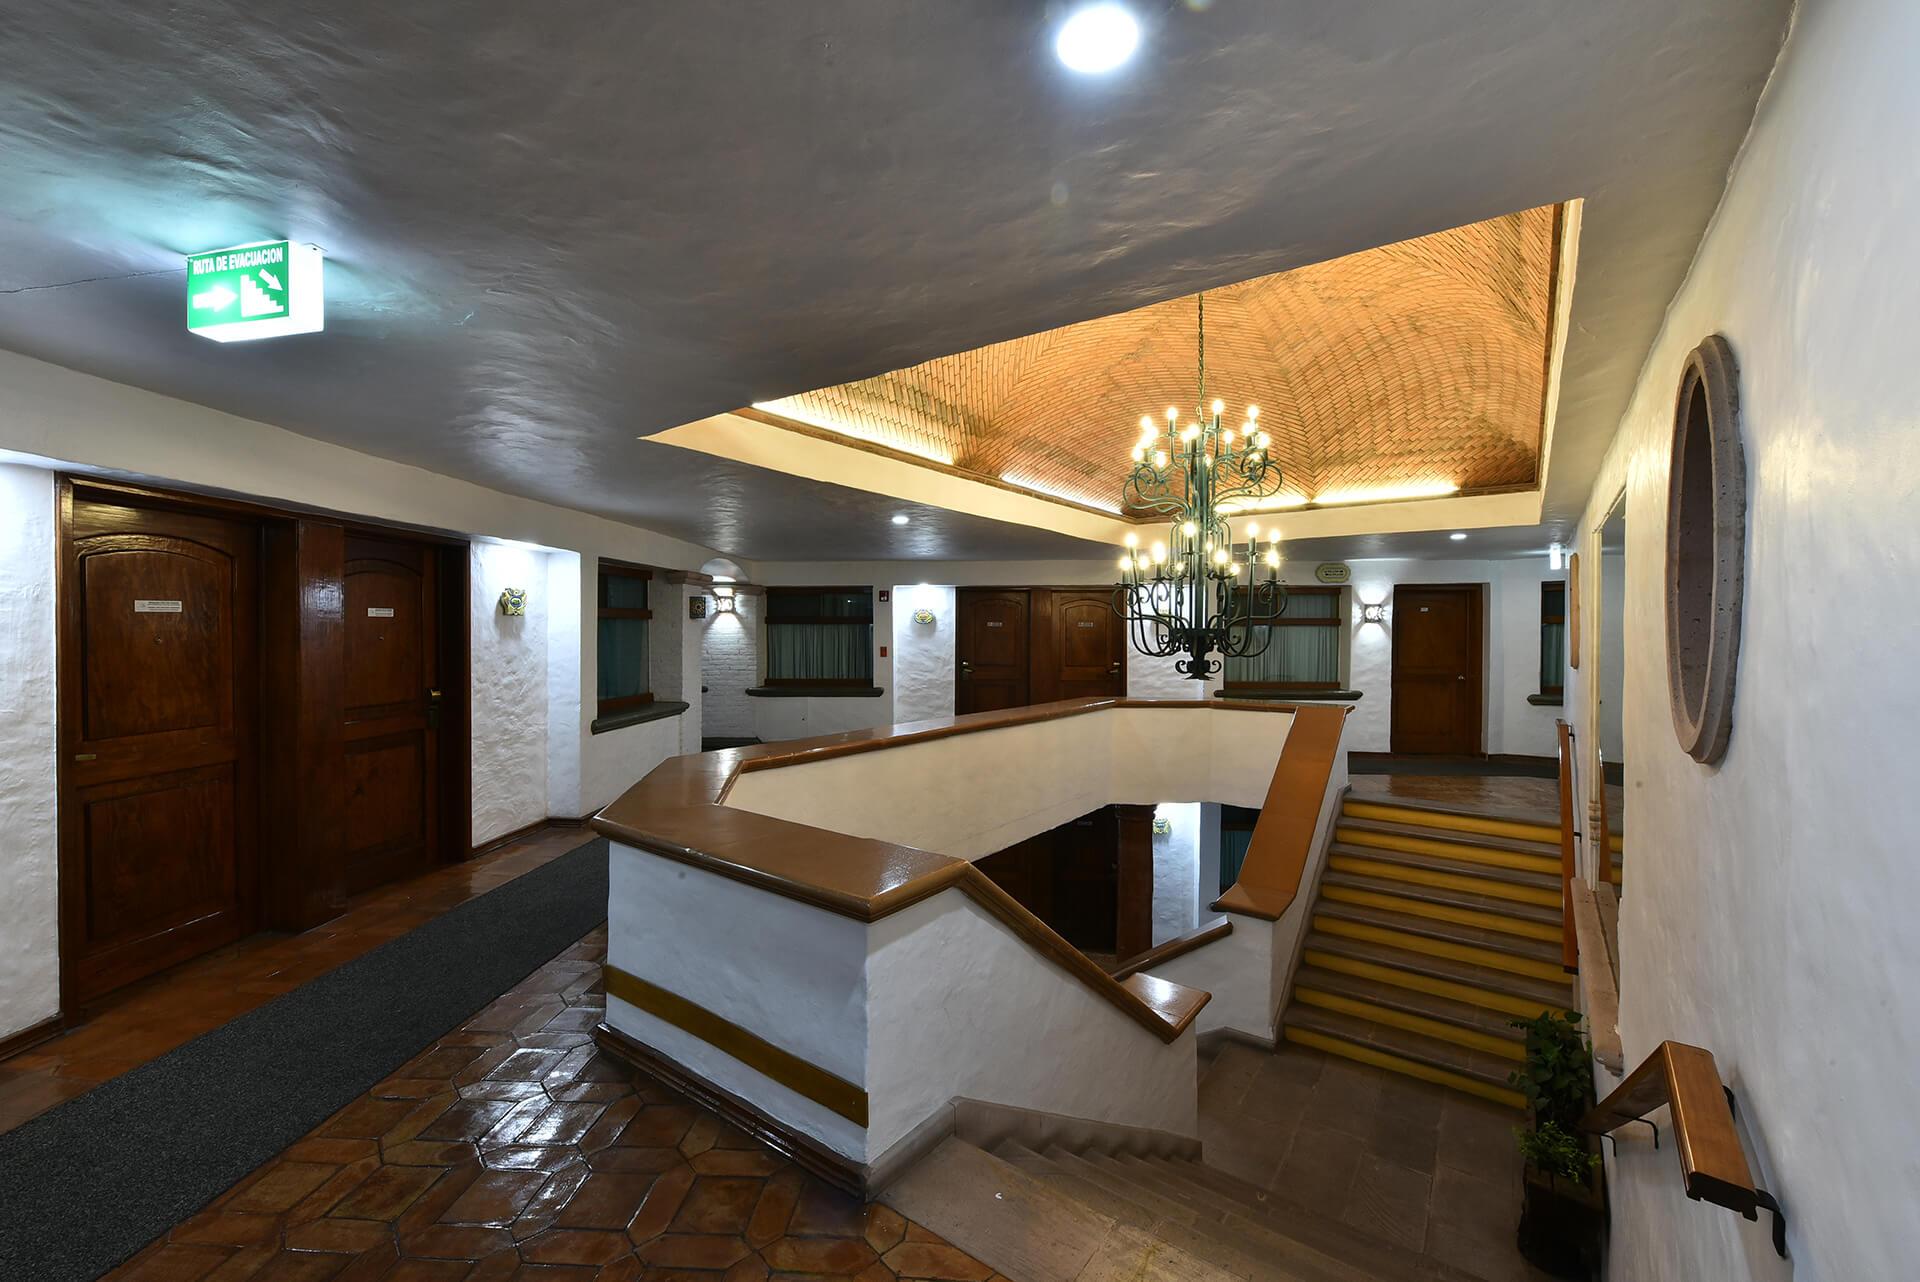 Holiday Inn Express Morelia - Imagen 4